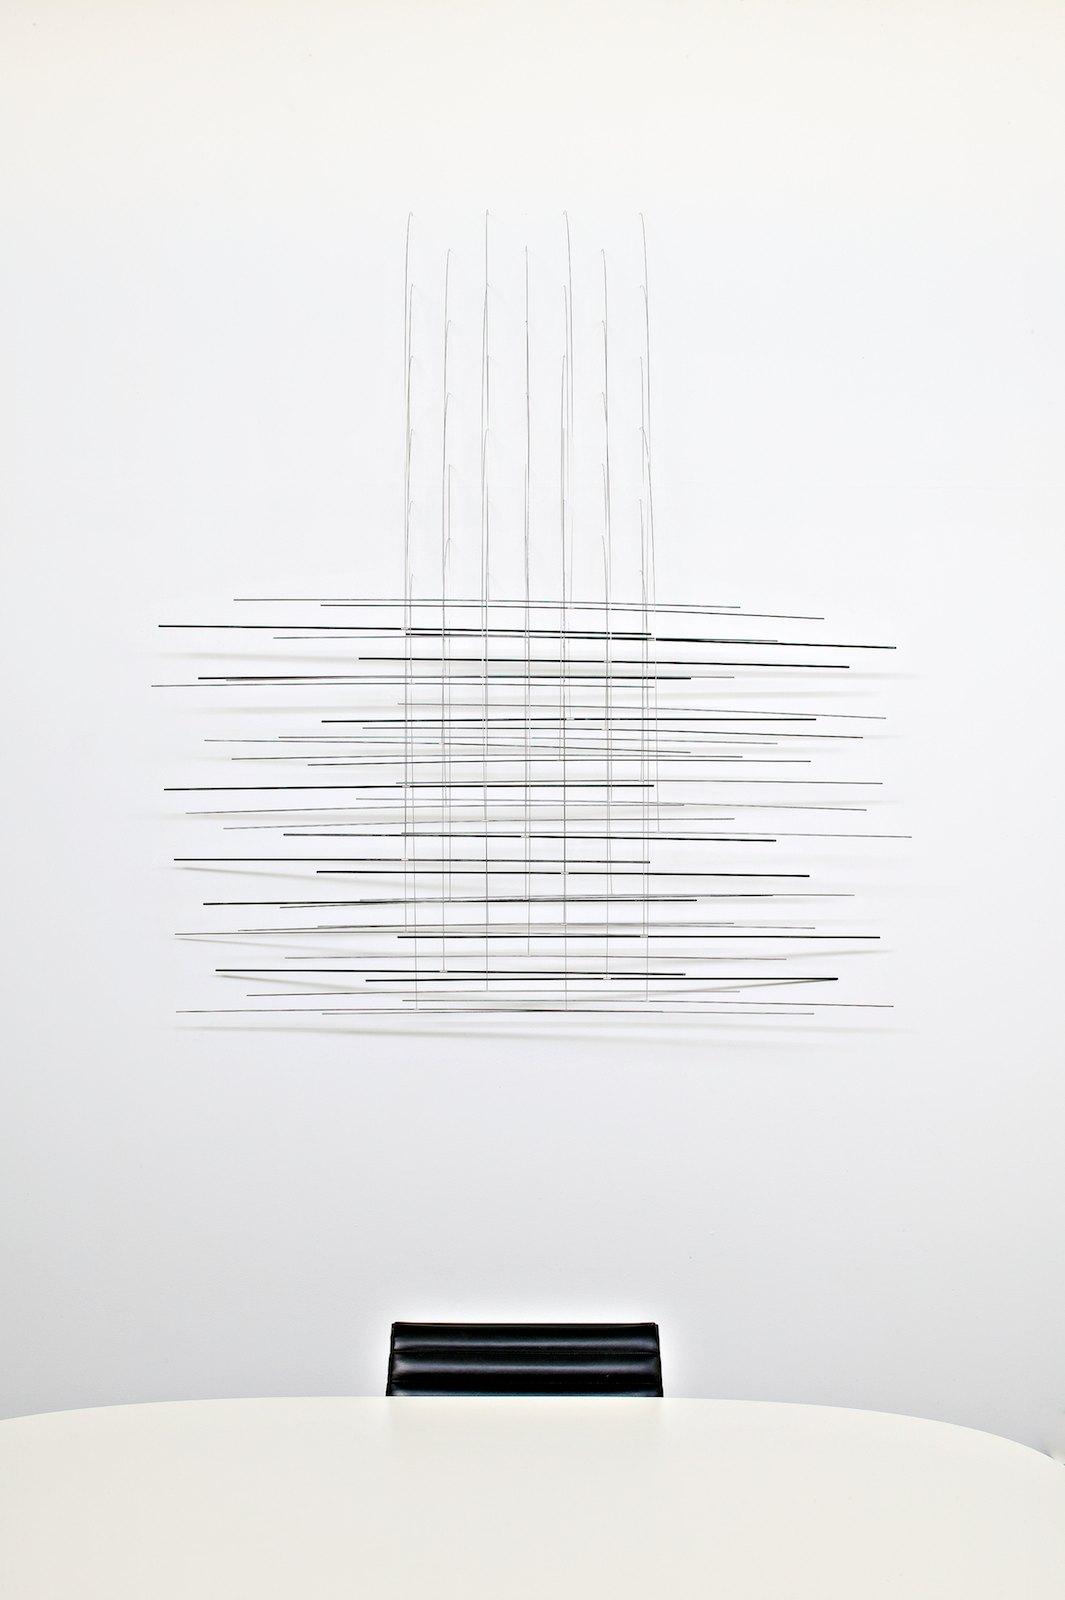 Sculpture III, 2006, steel, silver, 172 x 153 x 18 cm